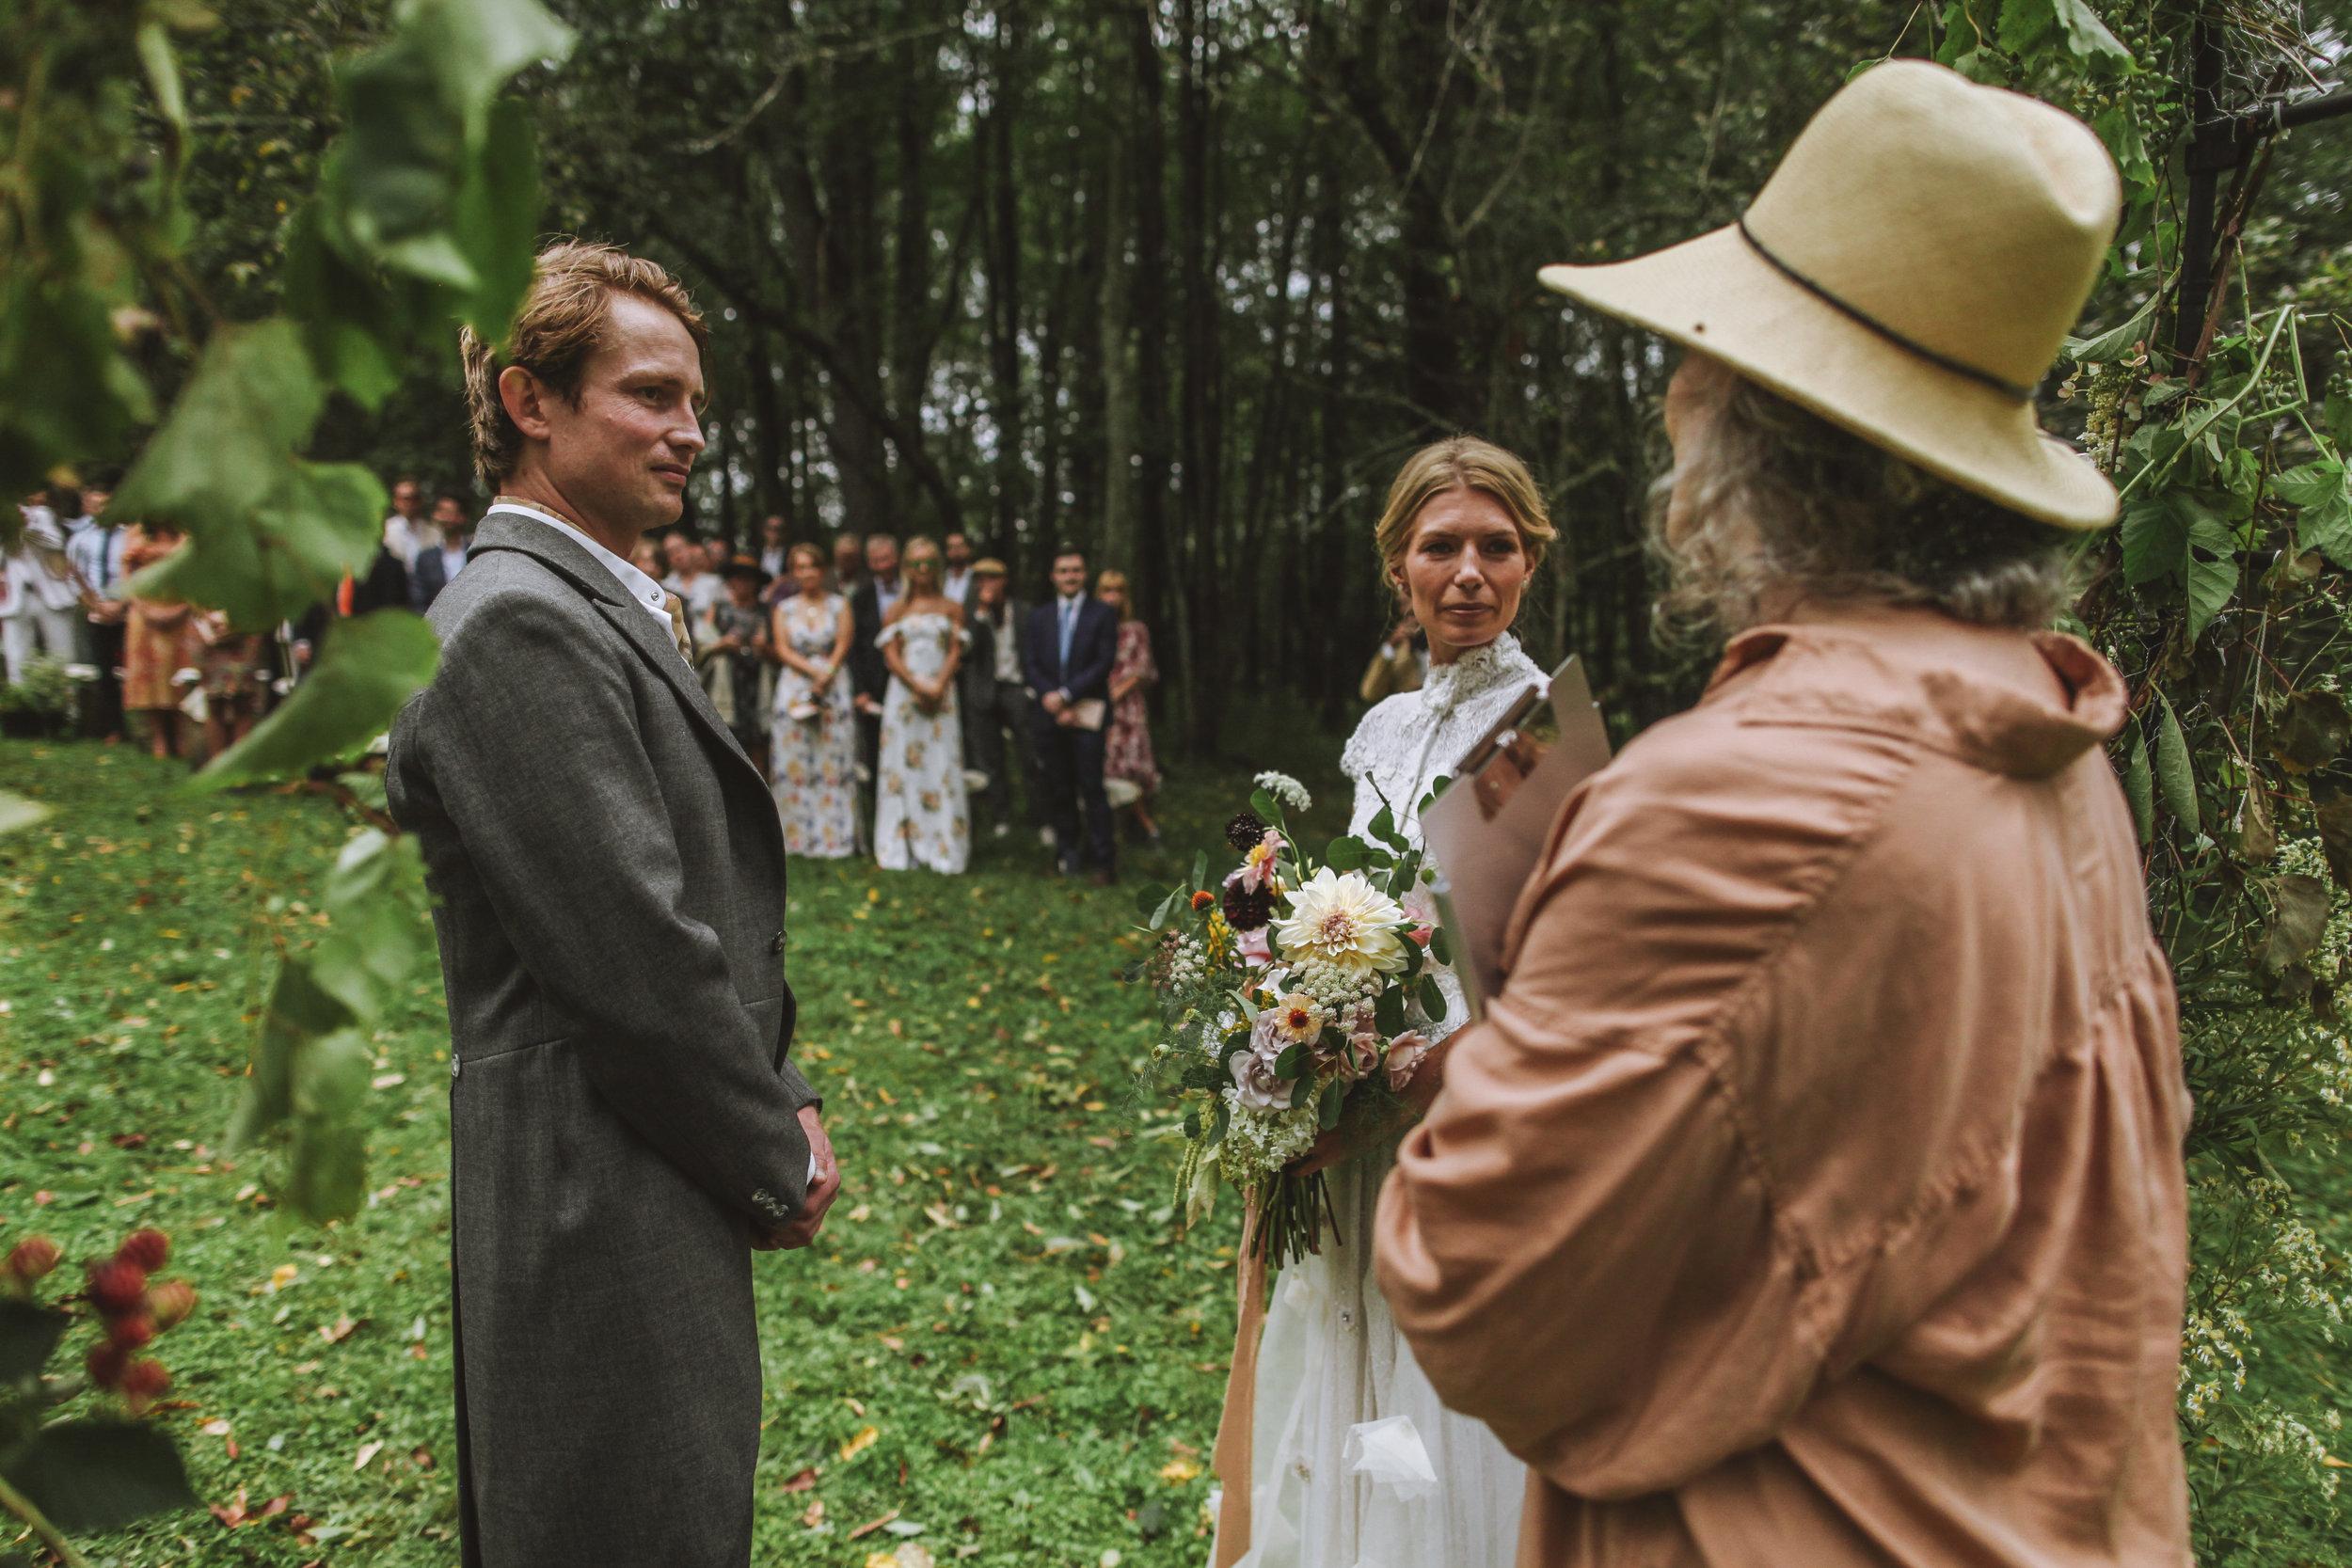 wedding_in_the_wild-ceremony-31.jpg